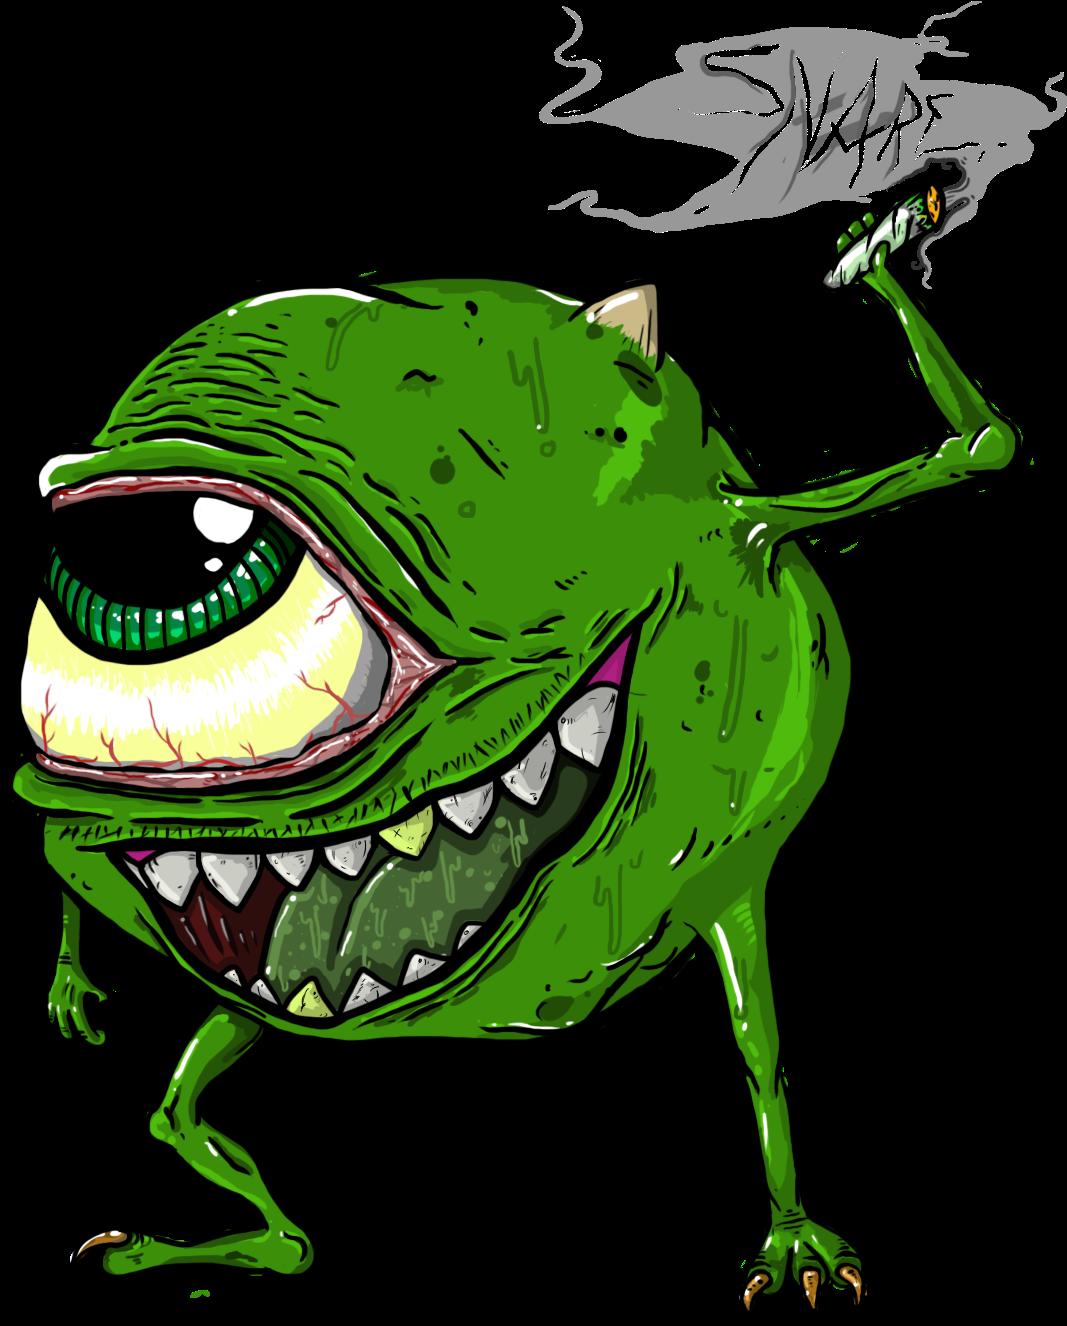 Svg Royalty Free Cannabis Drawing Cartoon Mike Wazowski Weed